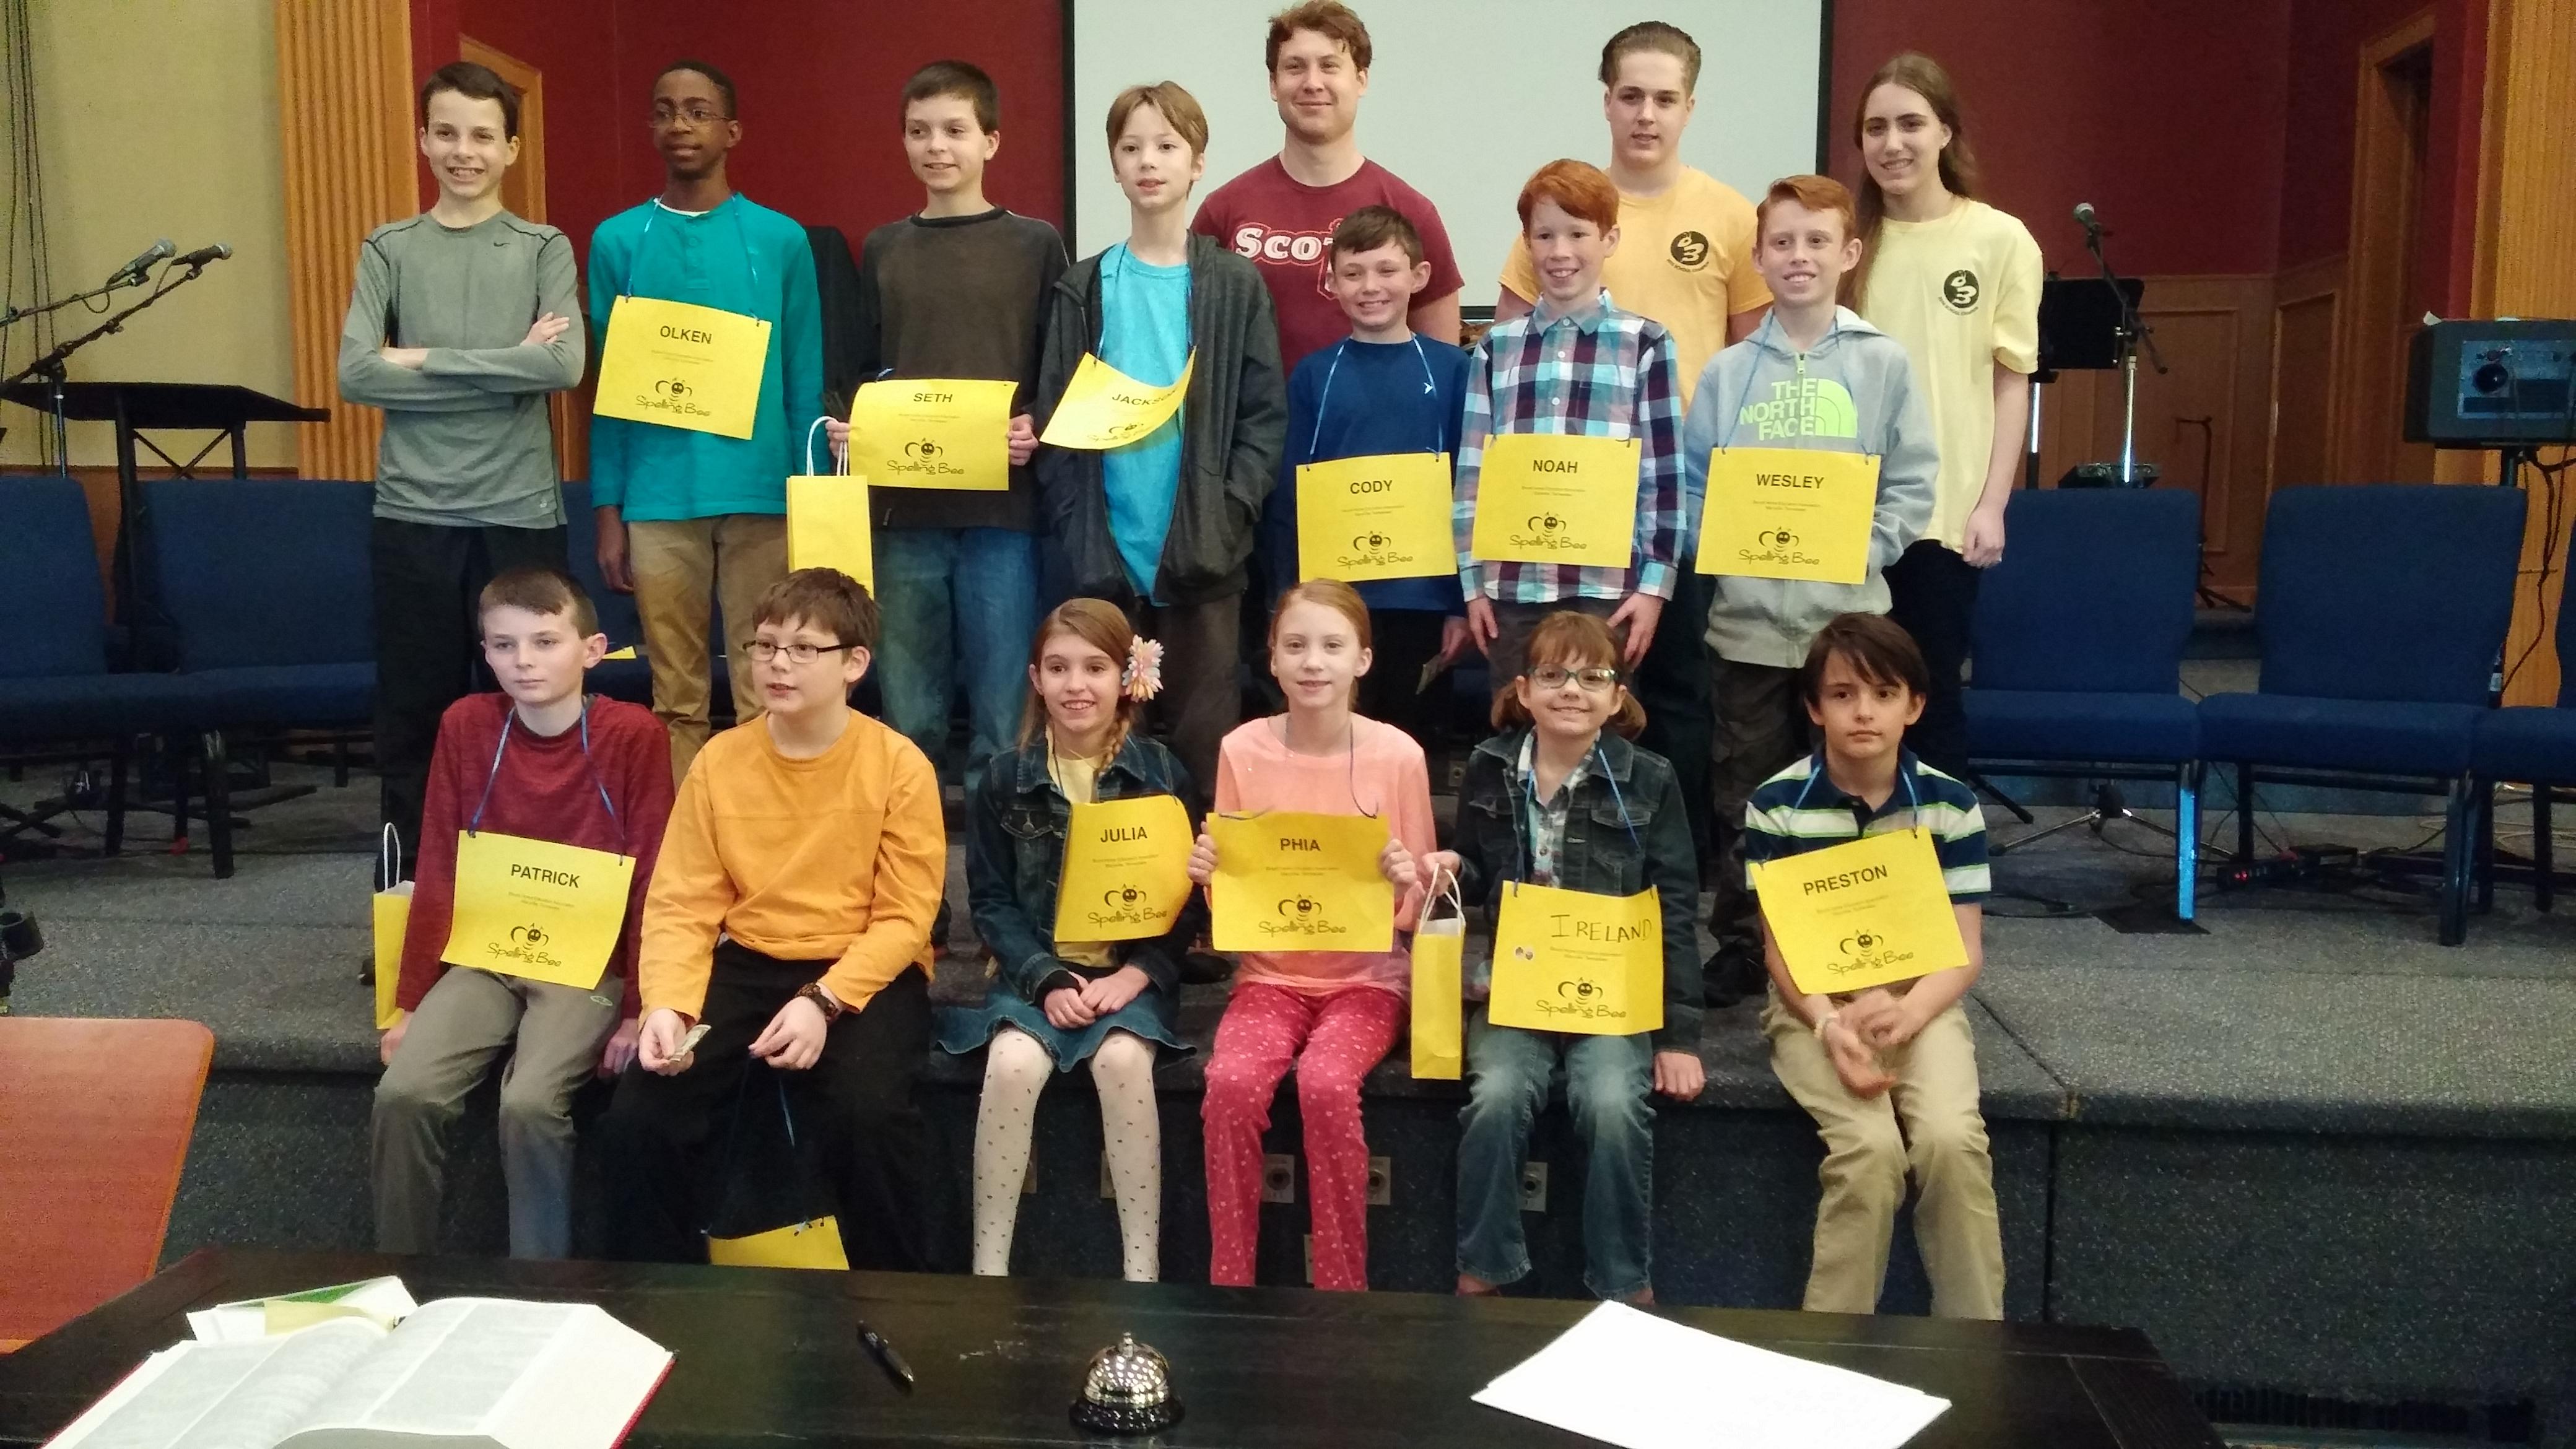 BHEA Spelling Bee - January 2017